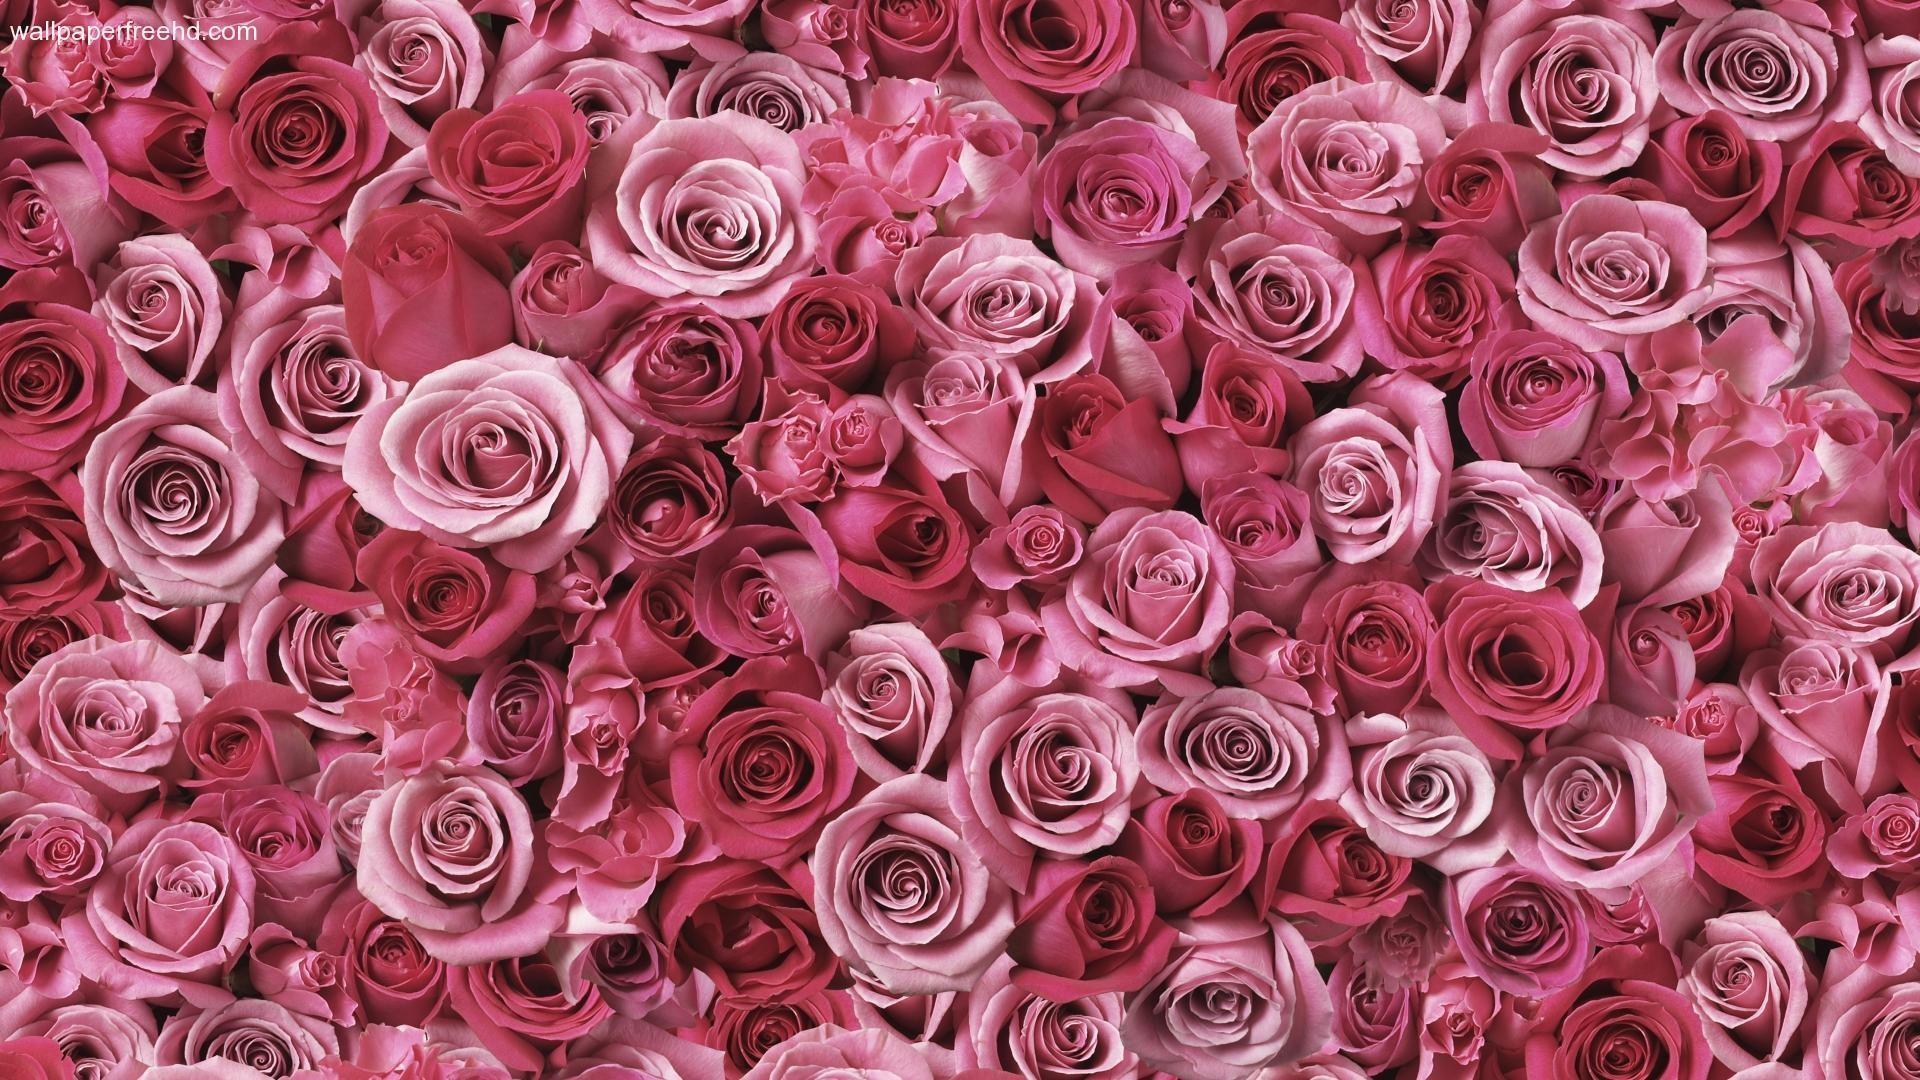 Pink Desktop Wallpaper 73 Images